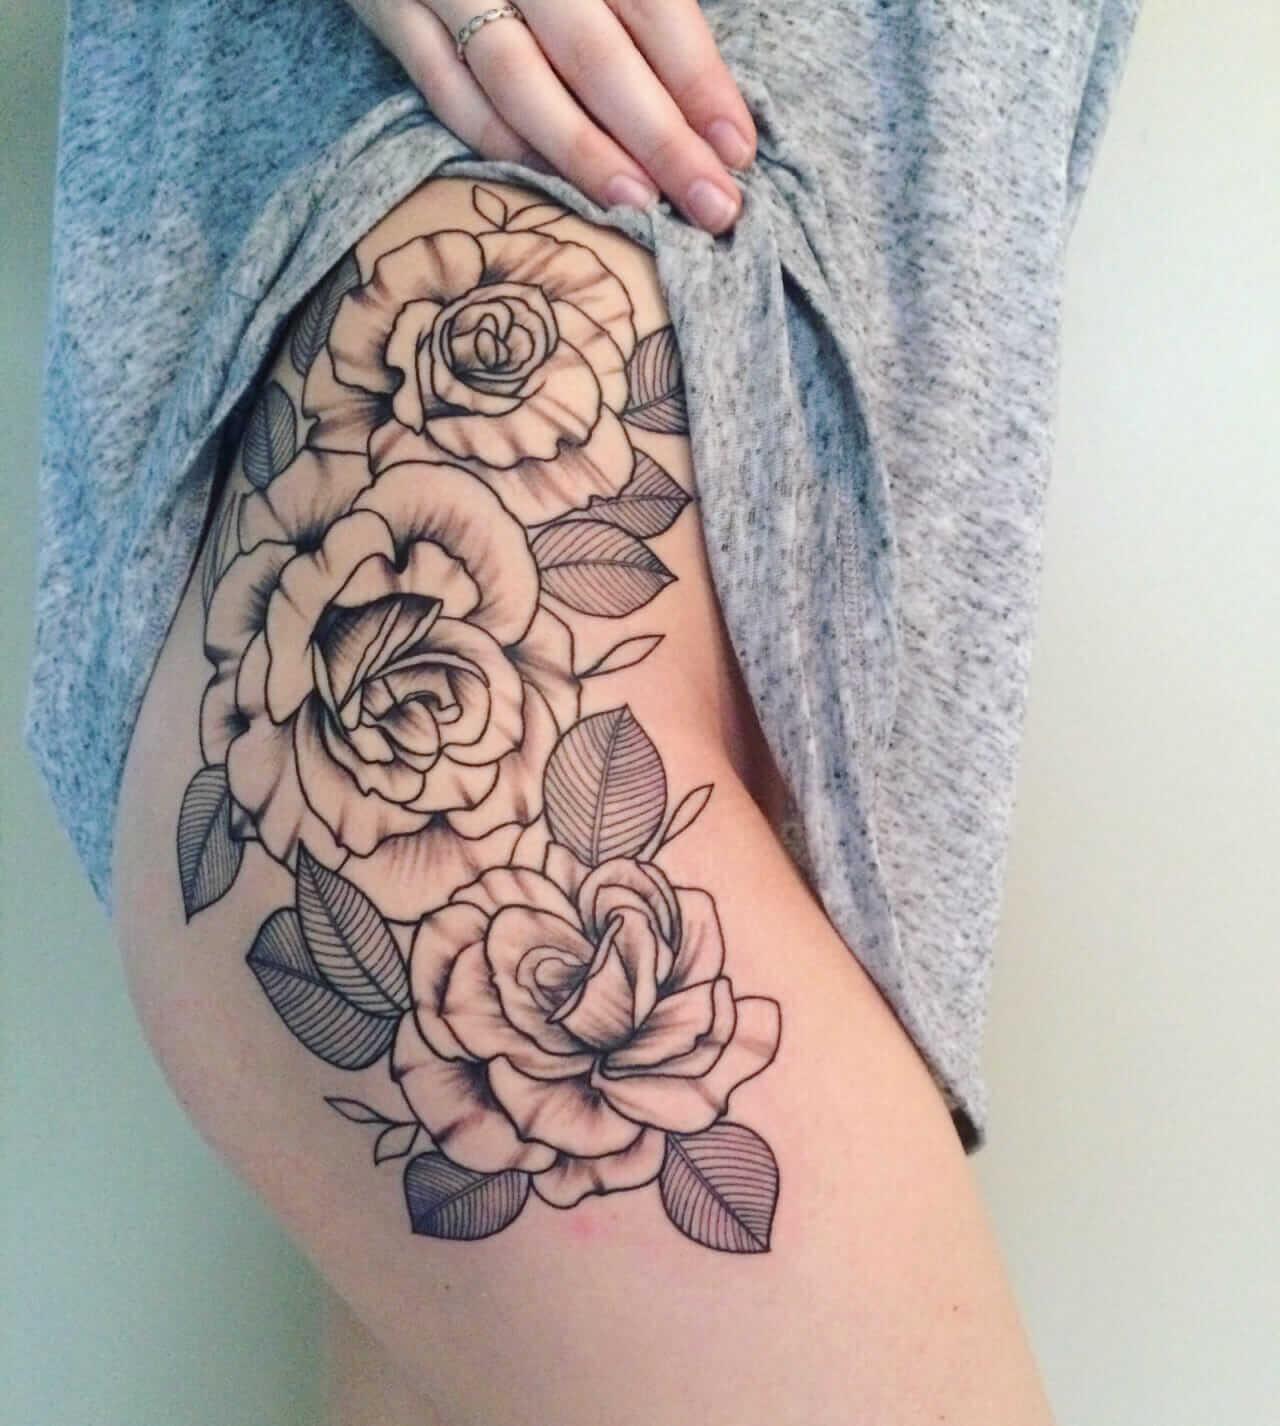 Roses tattoos on hip-thigh